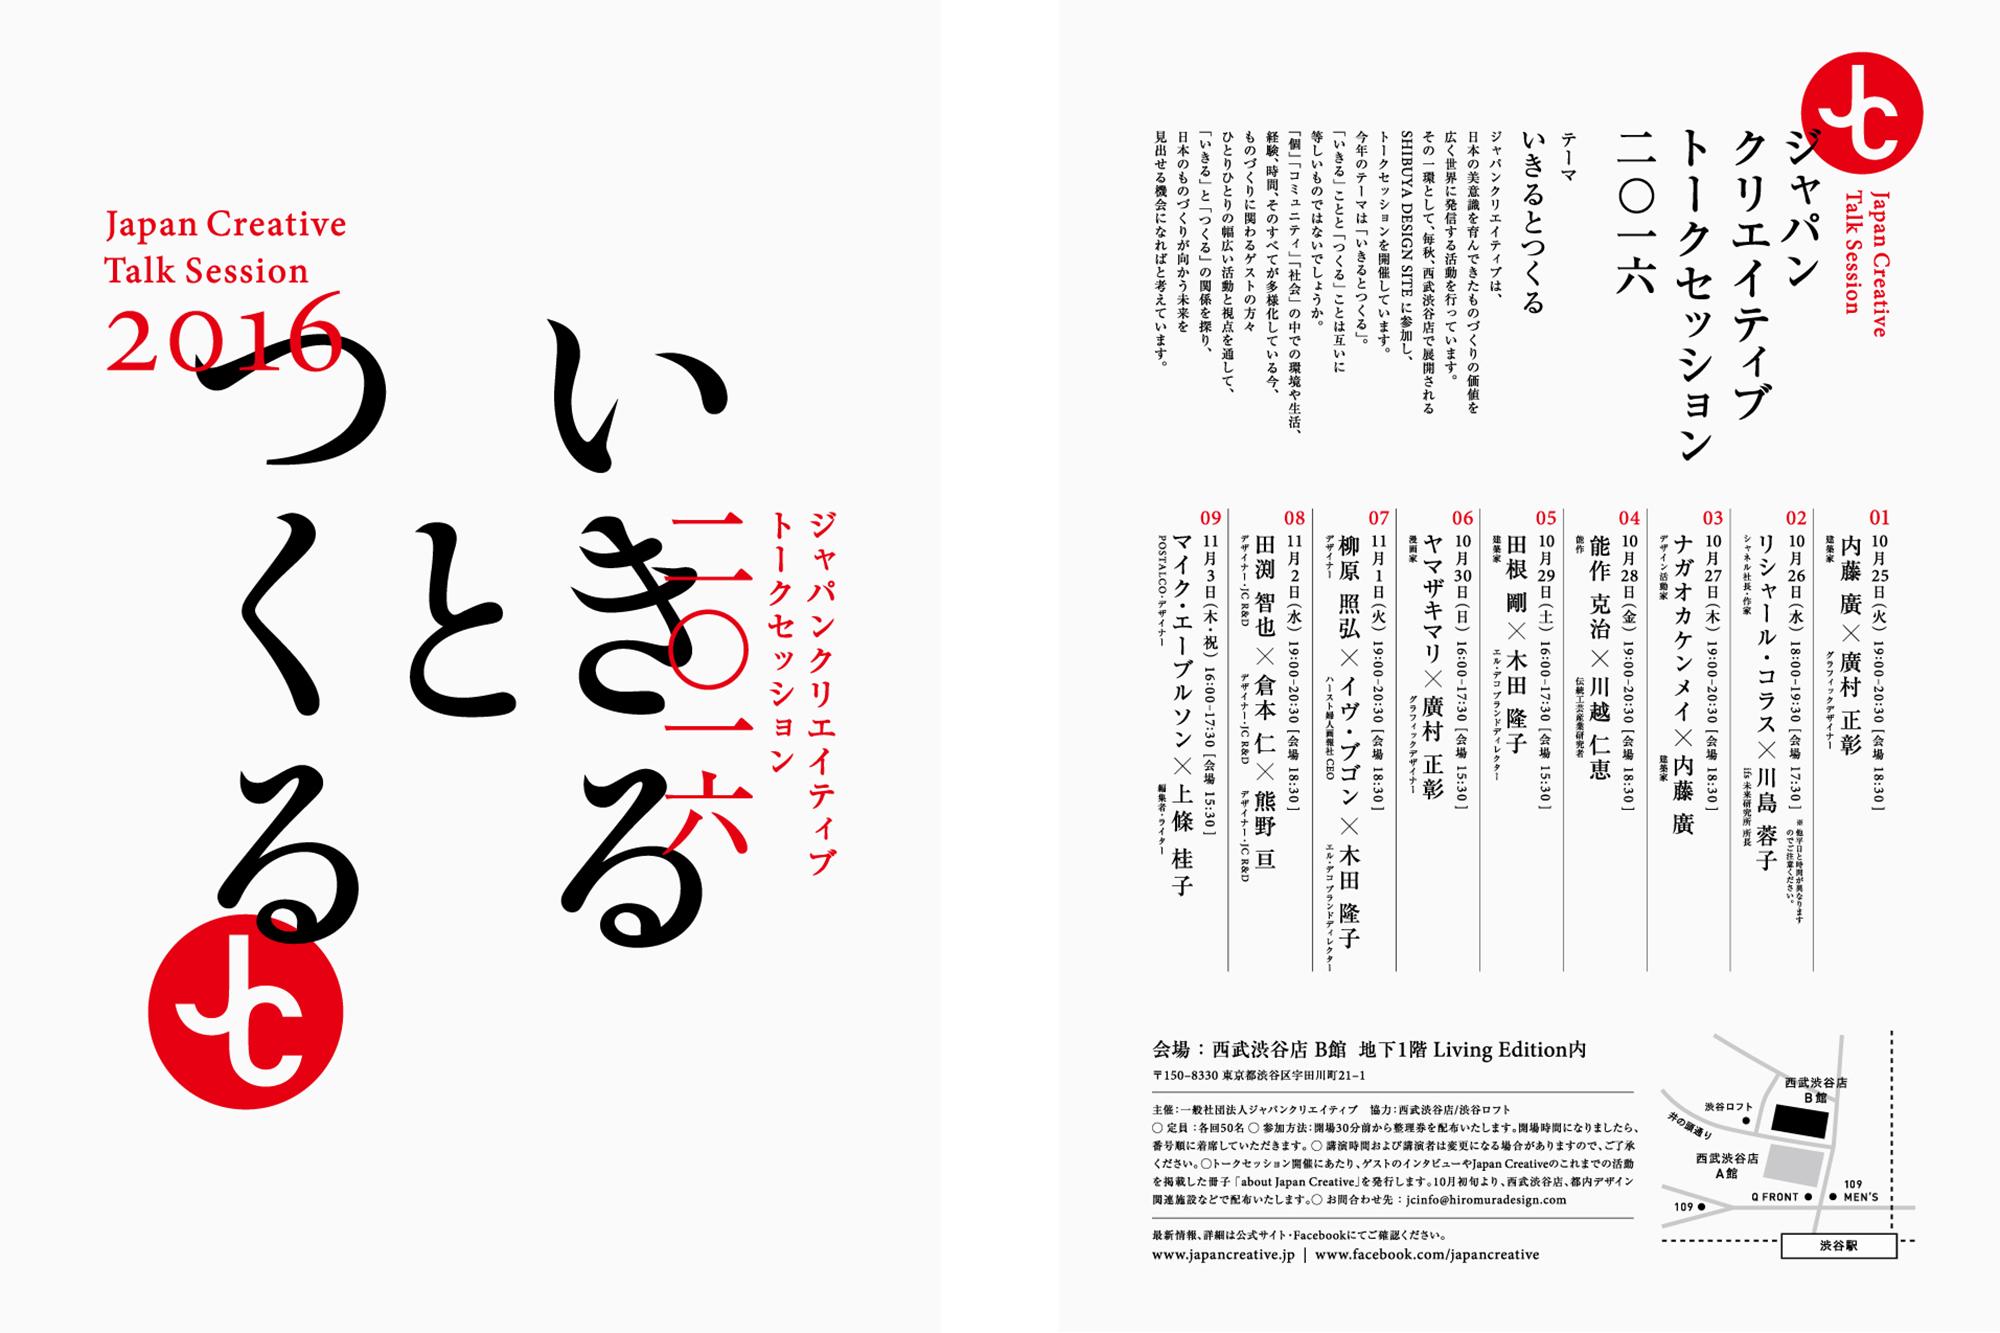 10.25(TUE) – 11.3(THU) 西武渋谷店 B館 地下1階